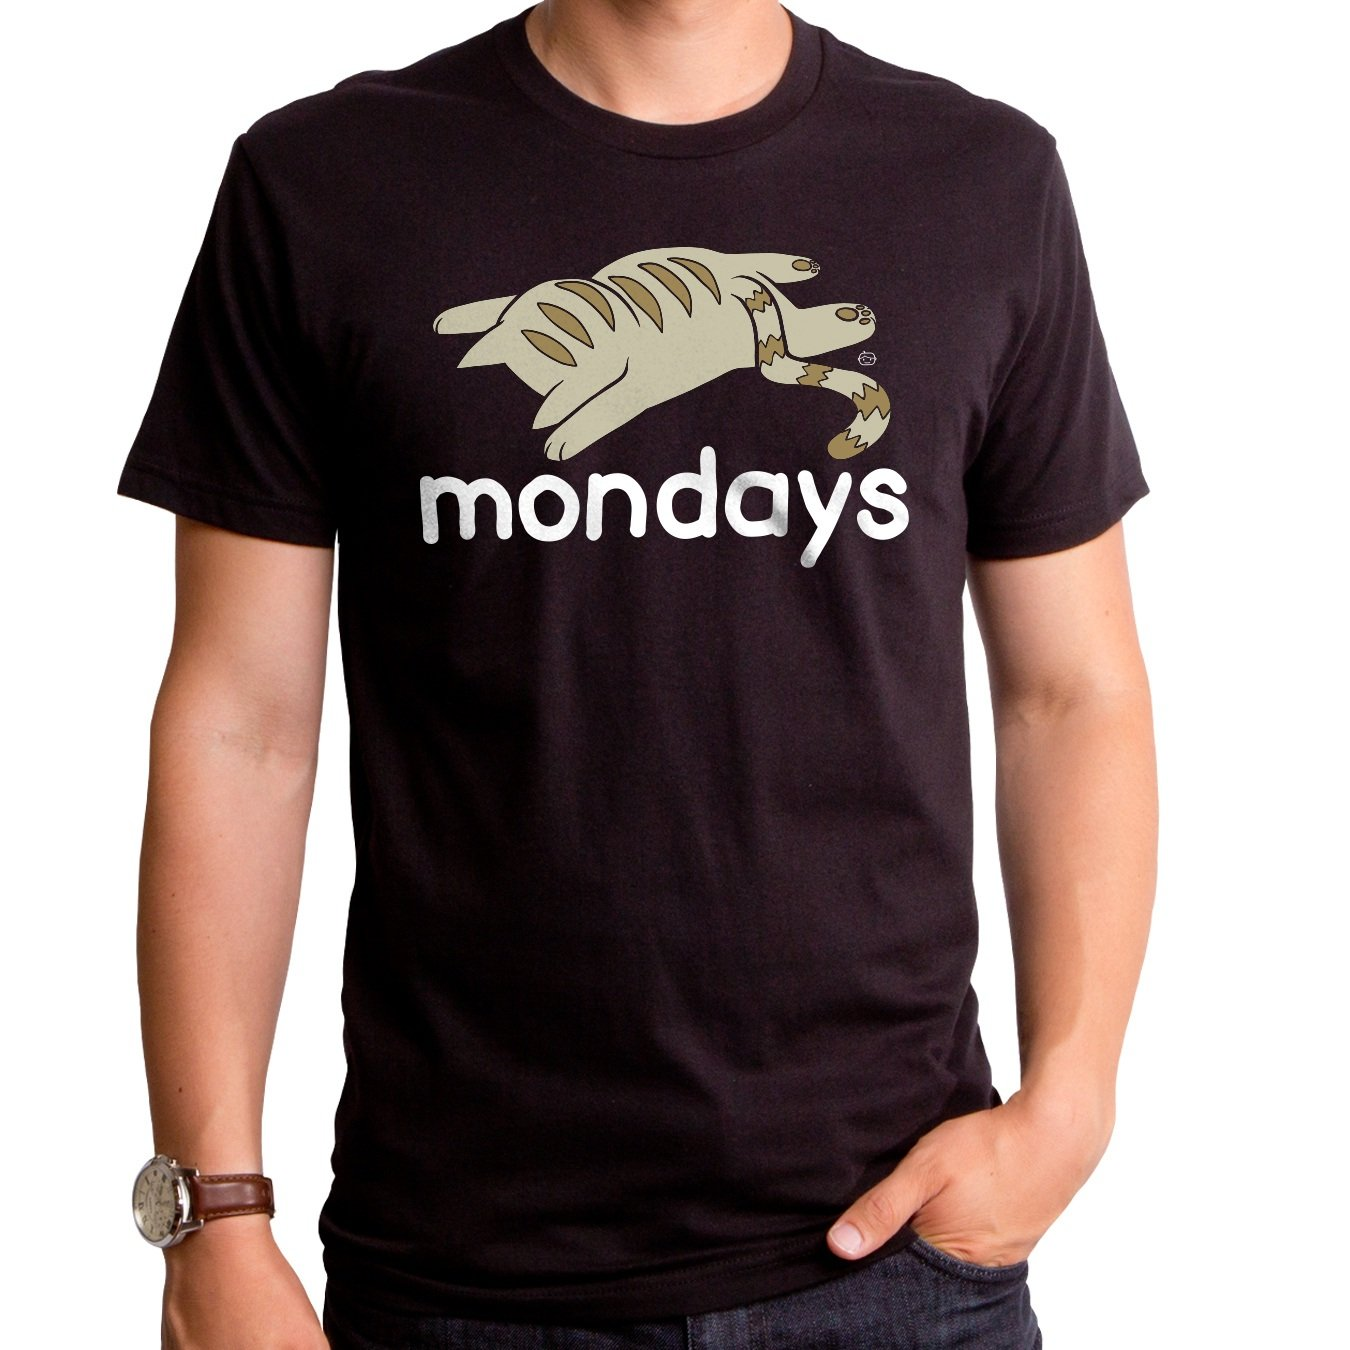 Goodie Mondays Sblack Short Sleeve S Crew Shirts